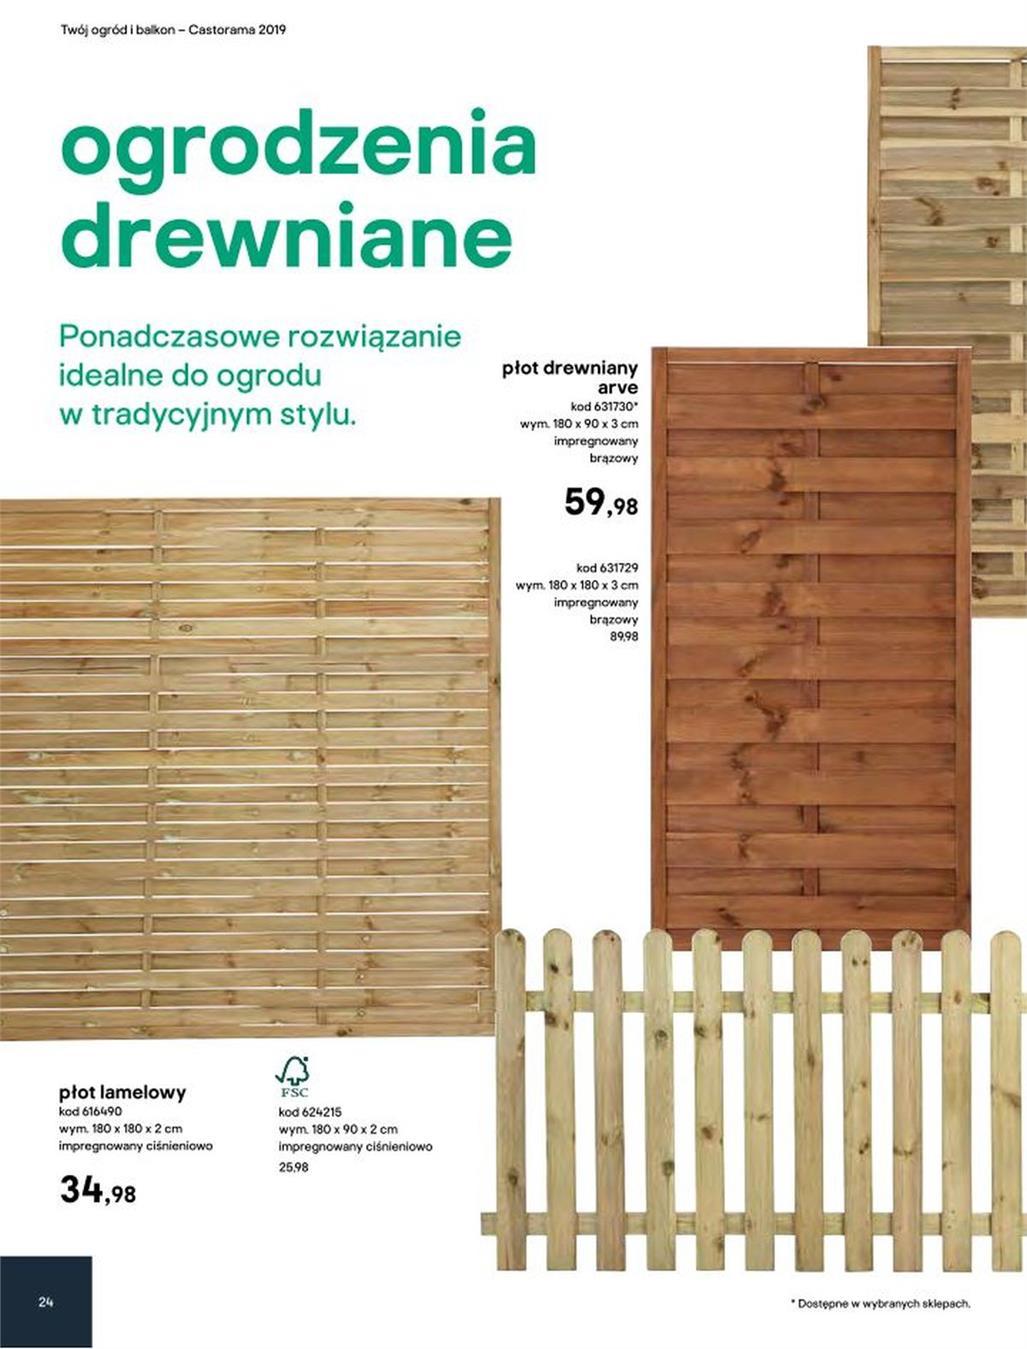 Gazetka Promocyjna Castoramapl Katalog Ogród 2019